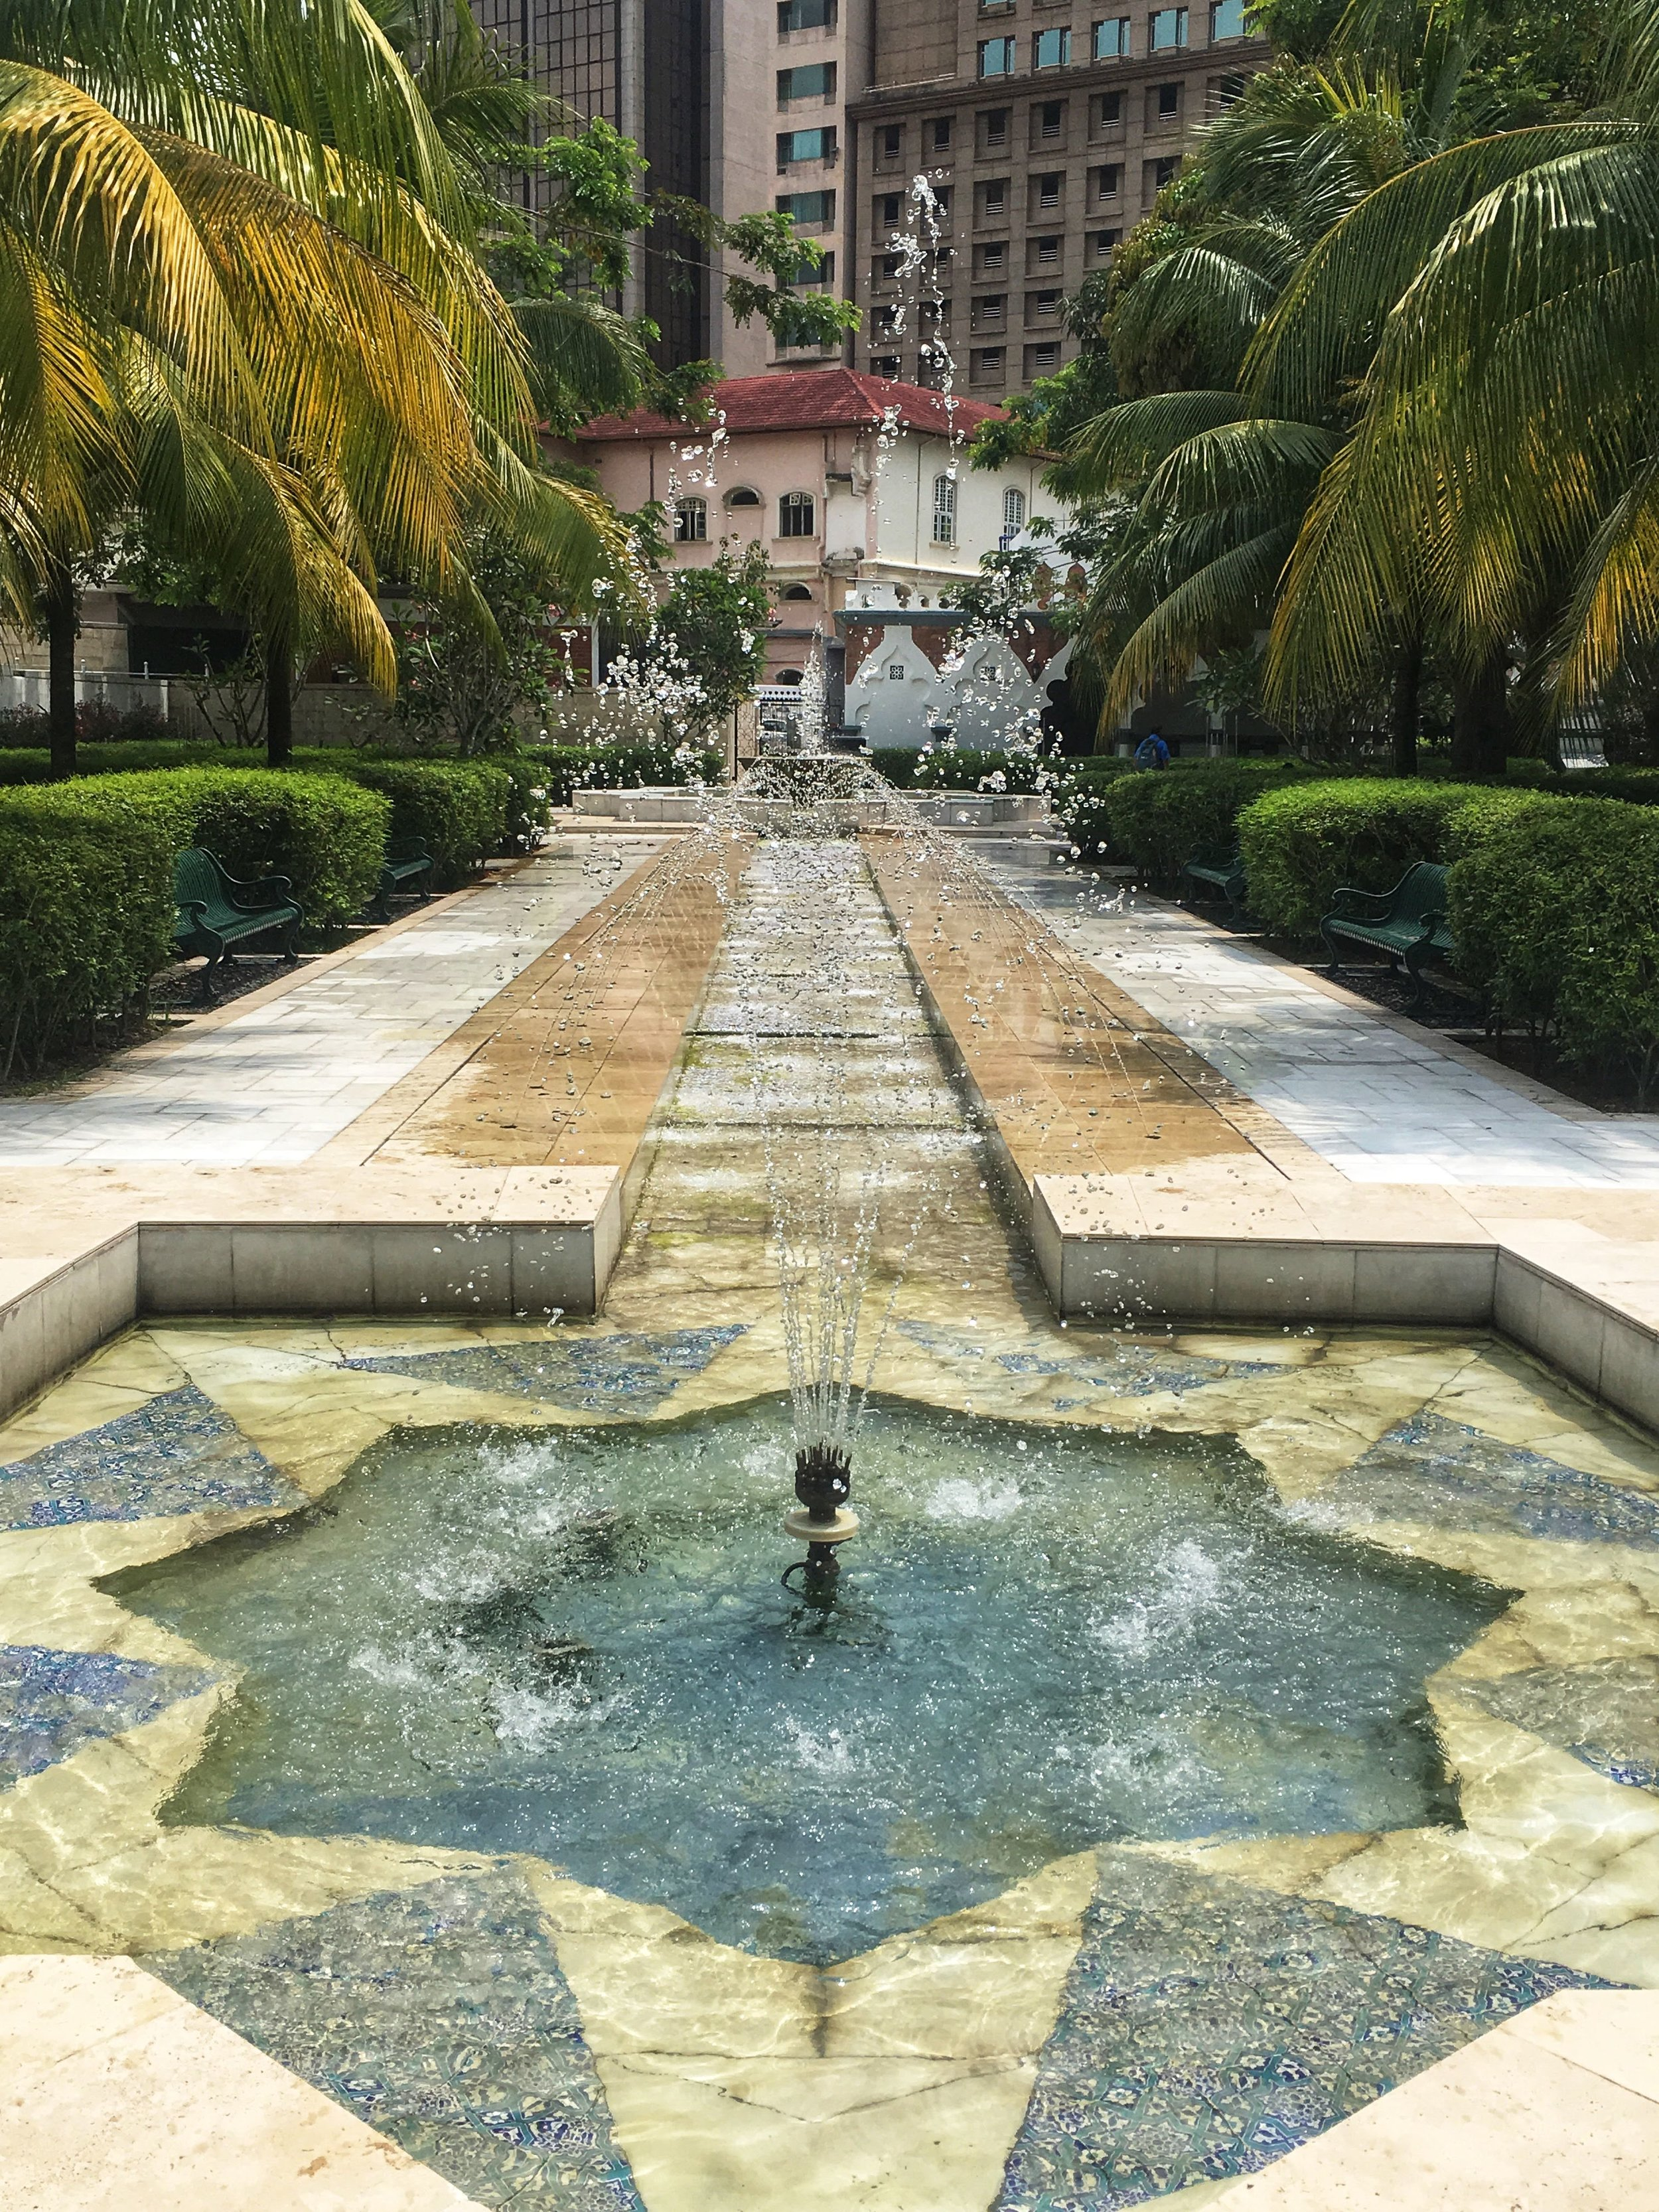 fountains in the gardens of Kuala Lumpur's Masjid Jamek